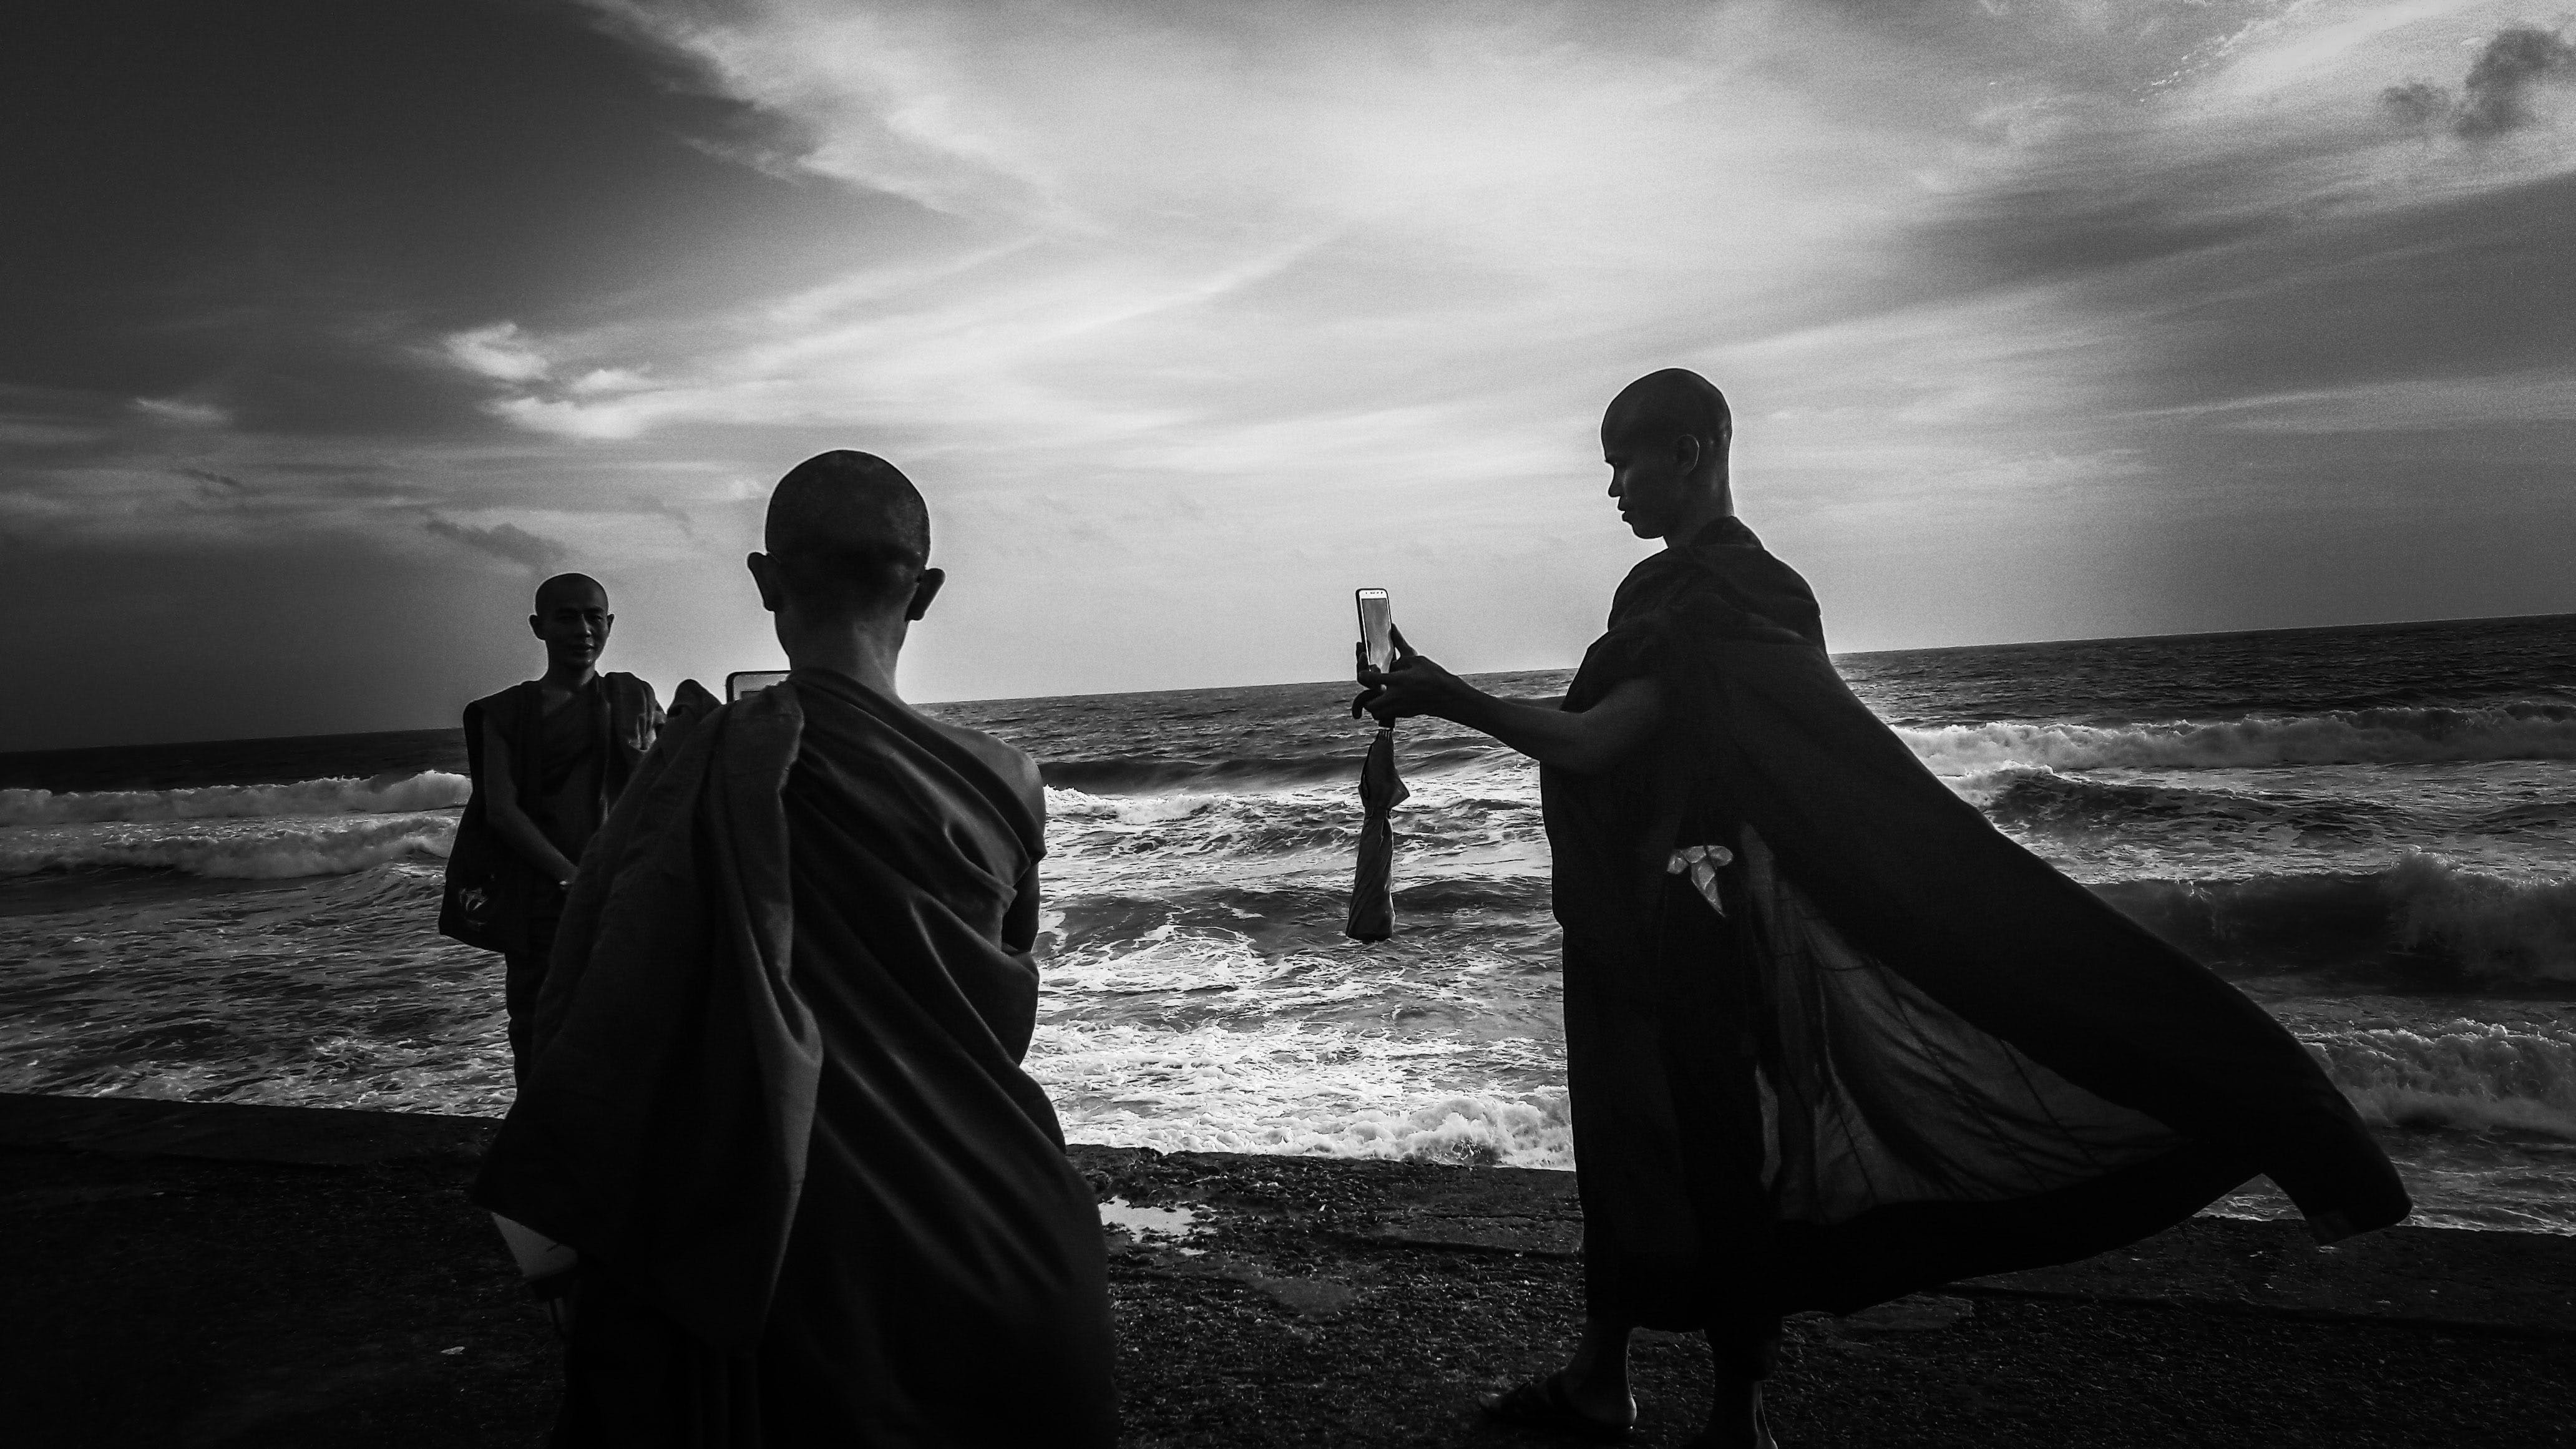 Greyscale Photography of Three Monks Near Ocean